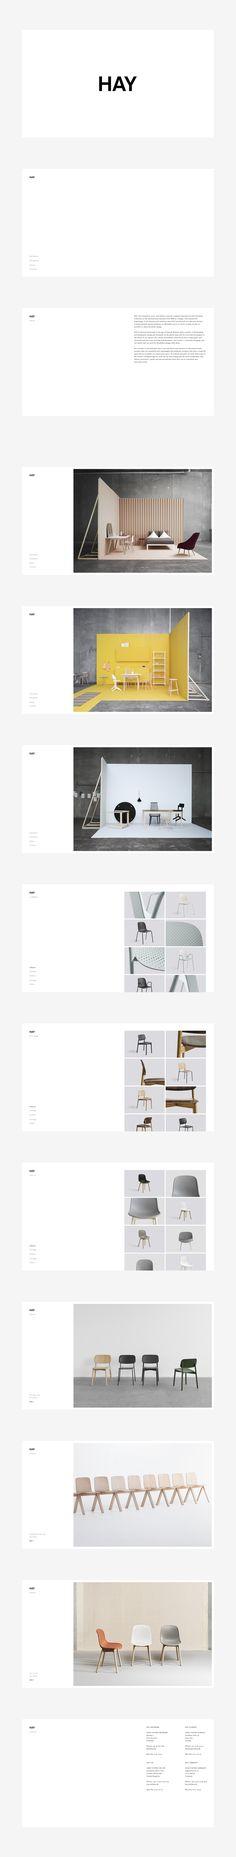 Ознакомьтесь с этим проектом @Behance: «HAY Concept» https://www.behance.net/gallery/46743001/HAY-Concept